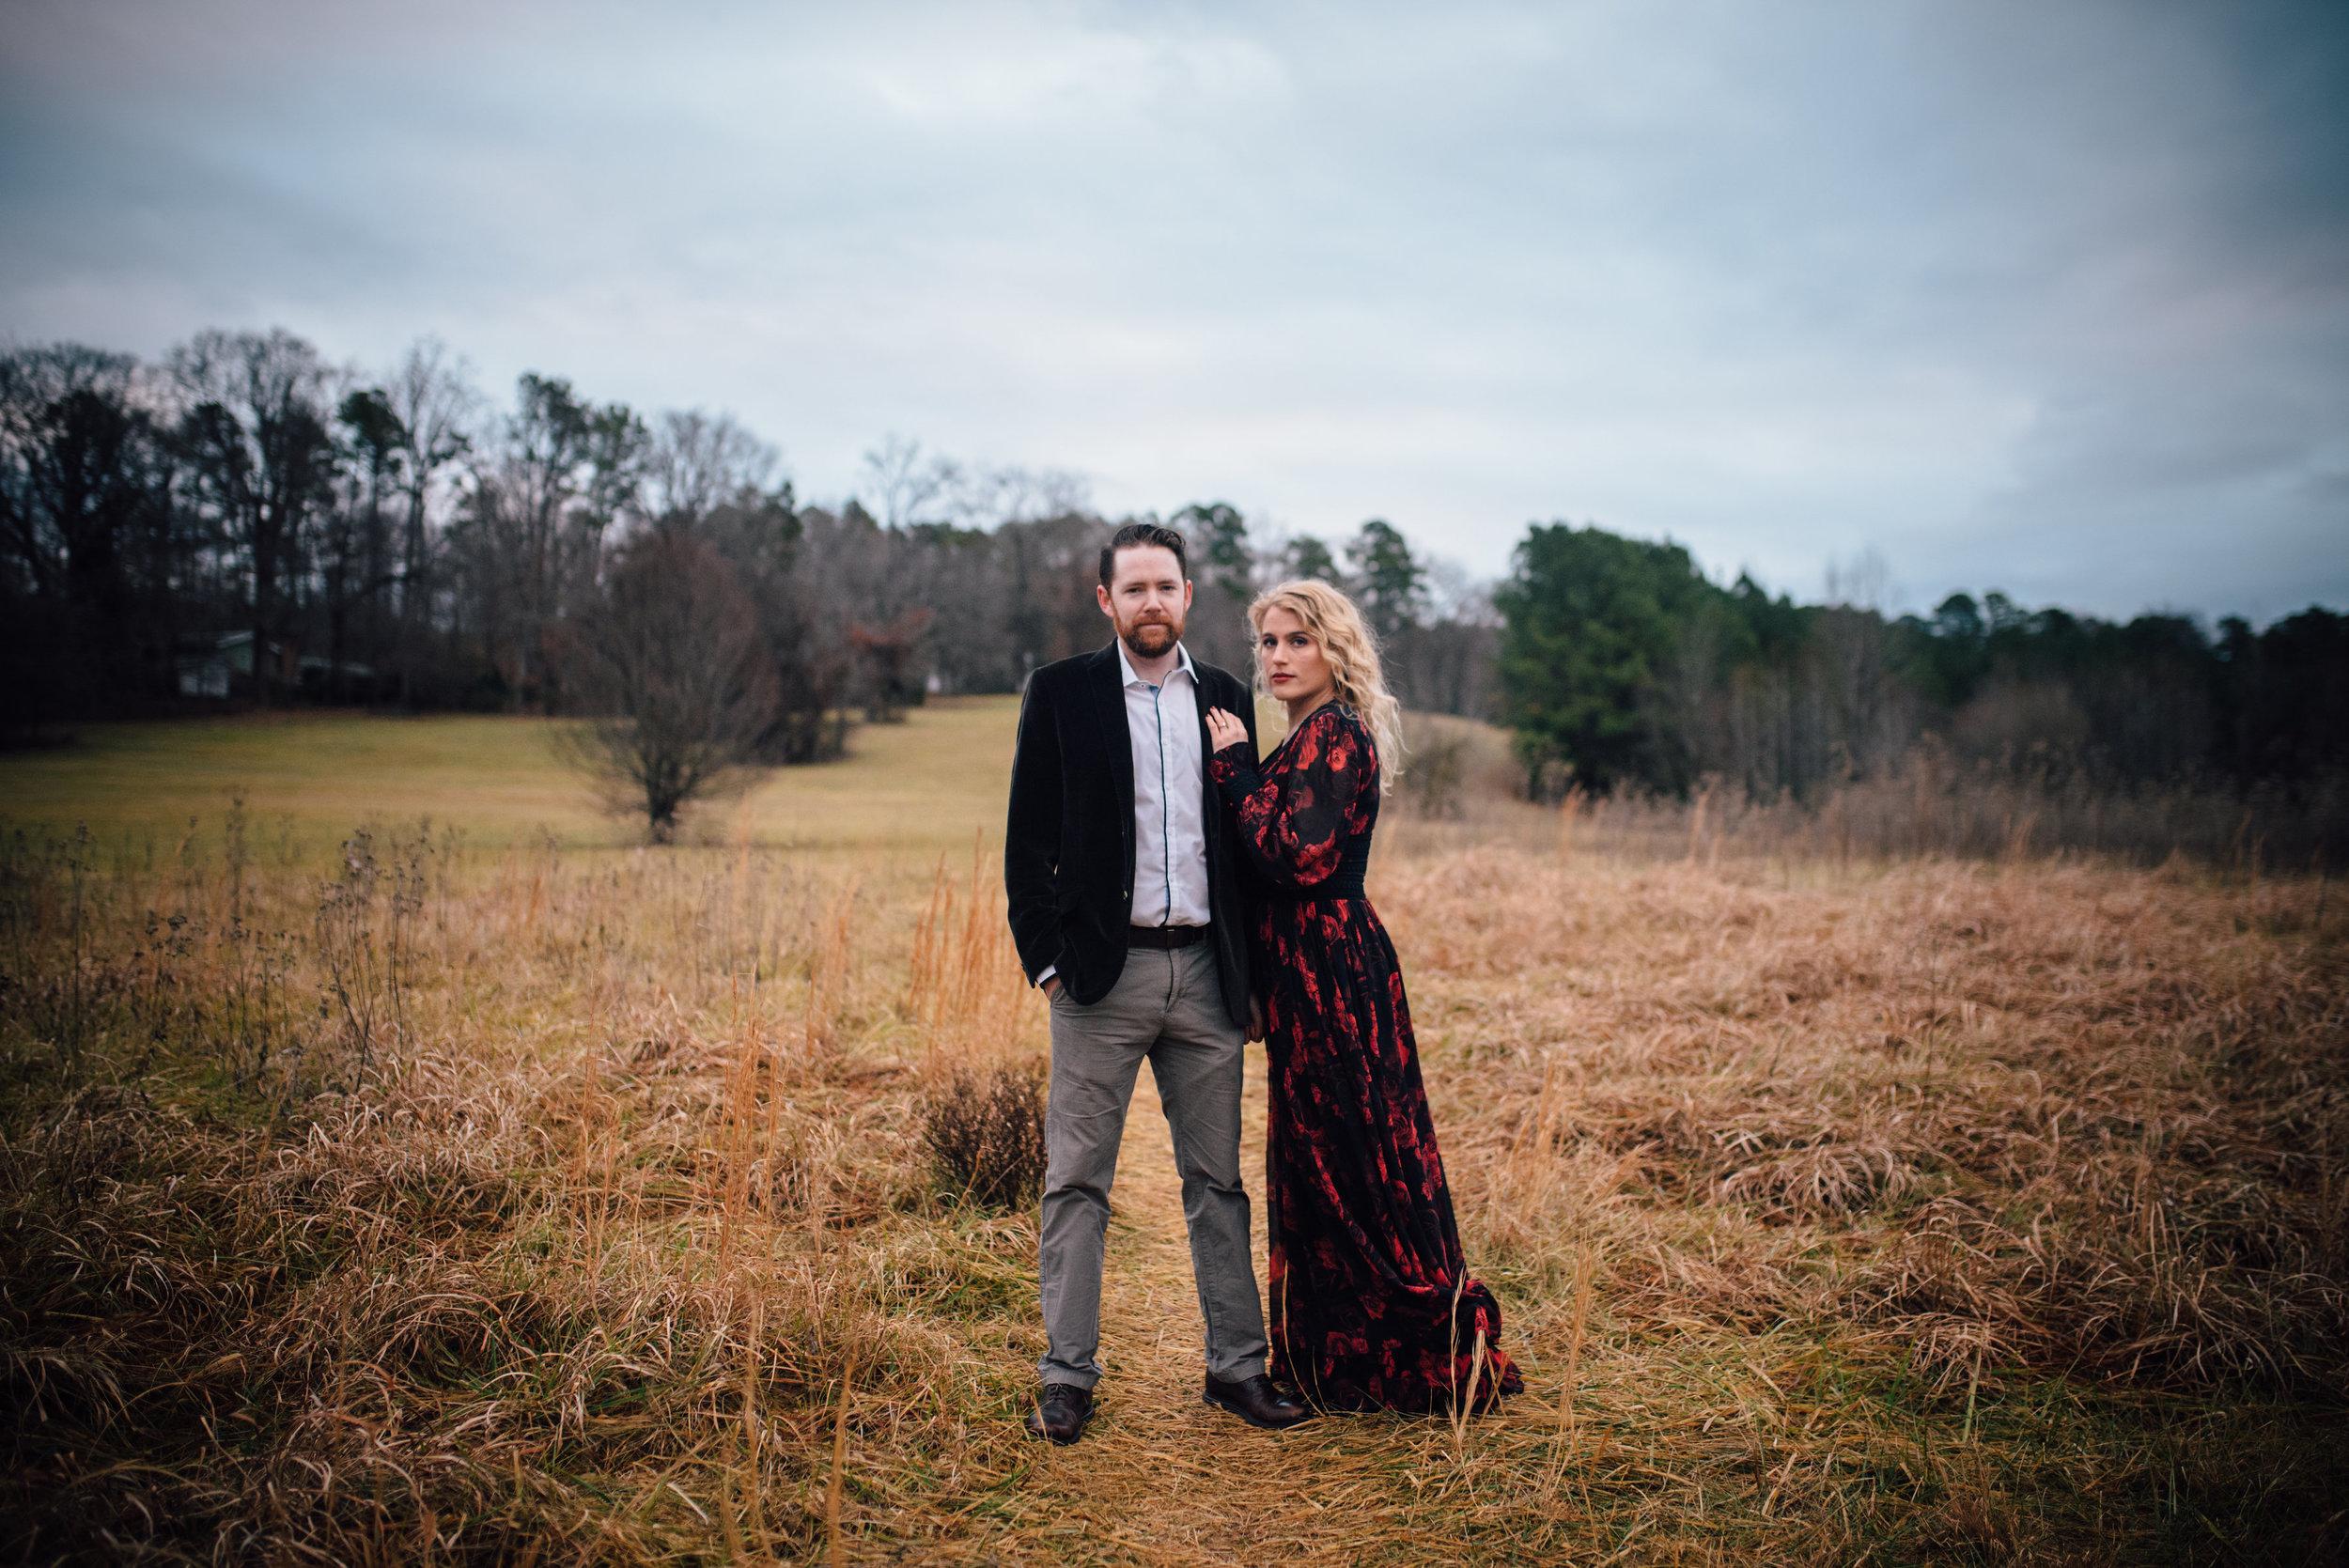 chapel hill wedding photographer - merritt's pasture engagement - north carolina wedding photographer